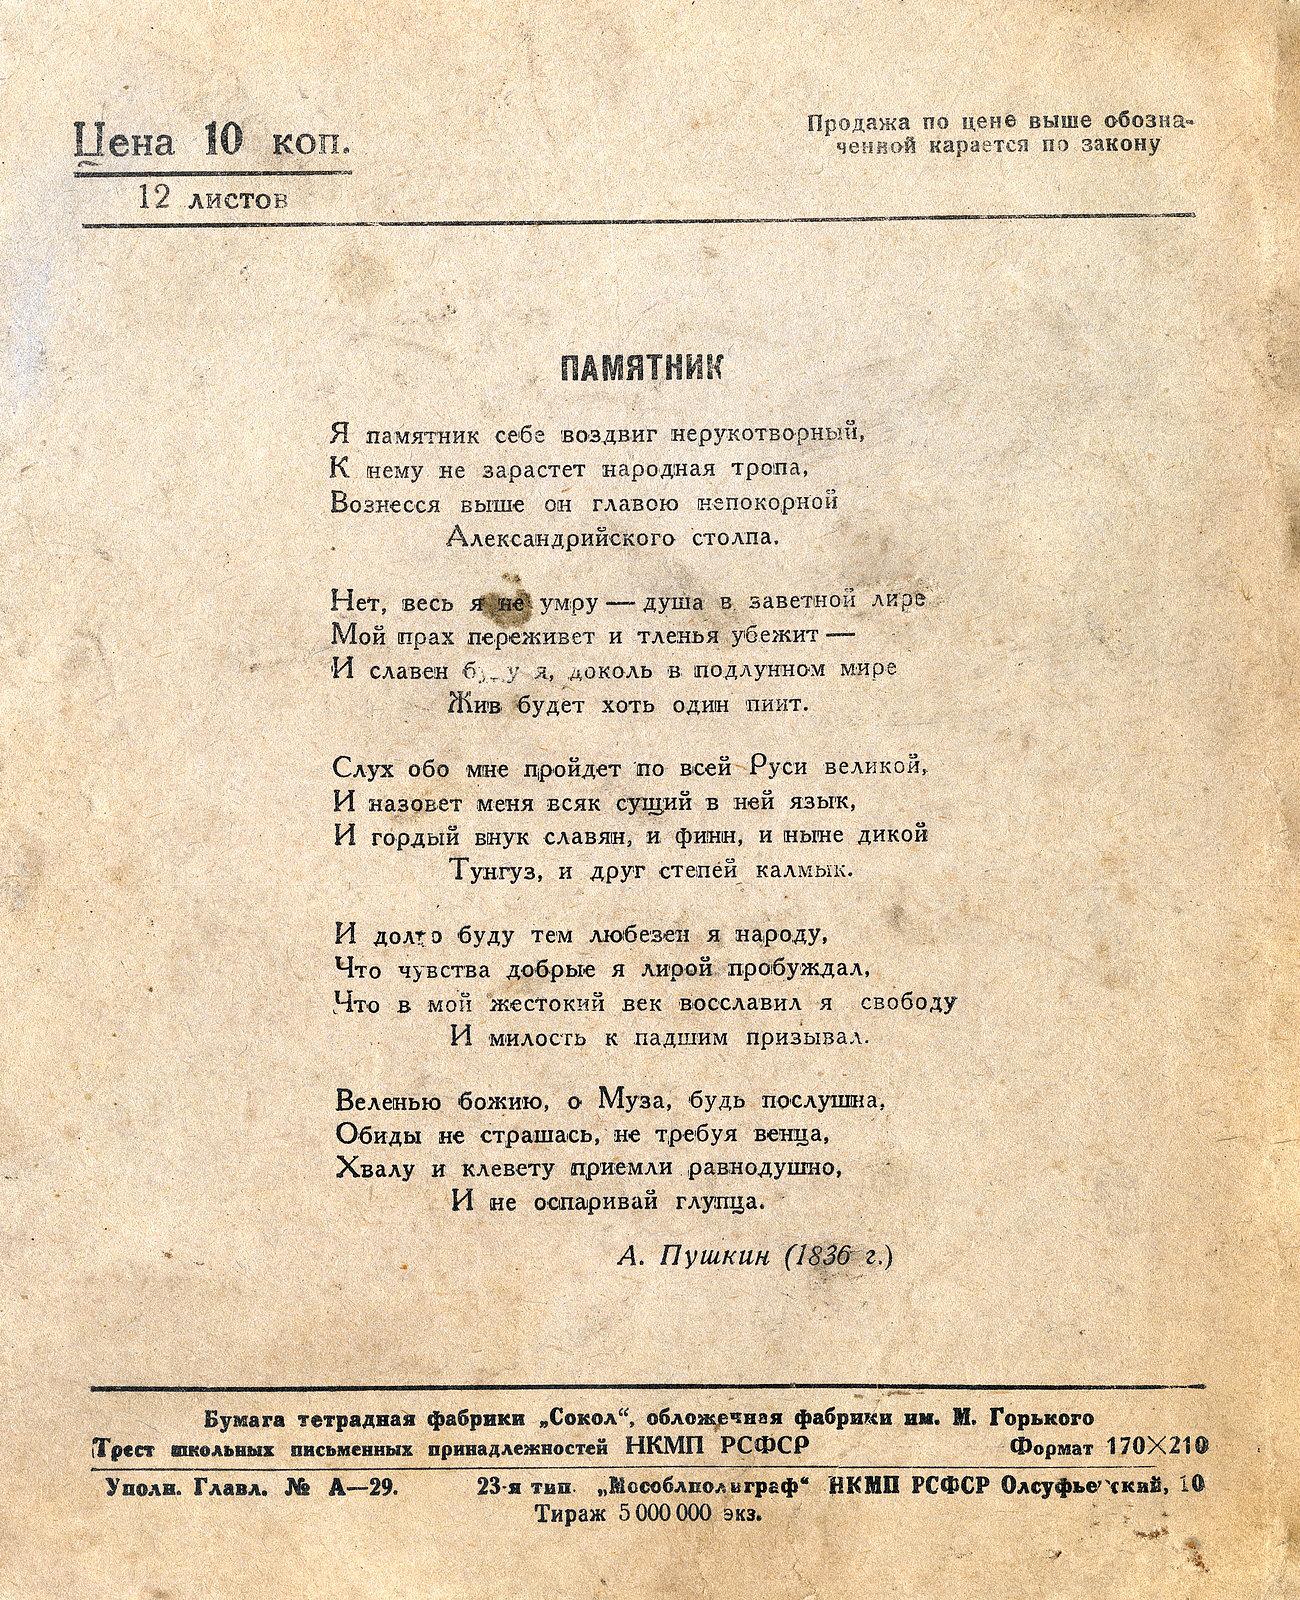 Тетрадь Пушкин, 1937, 2 оборот